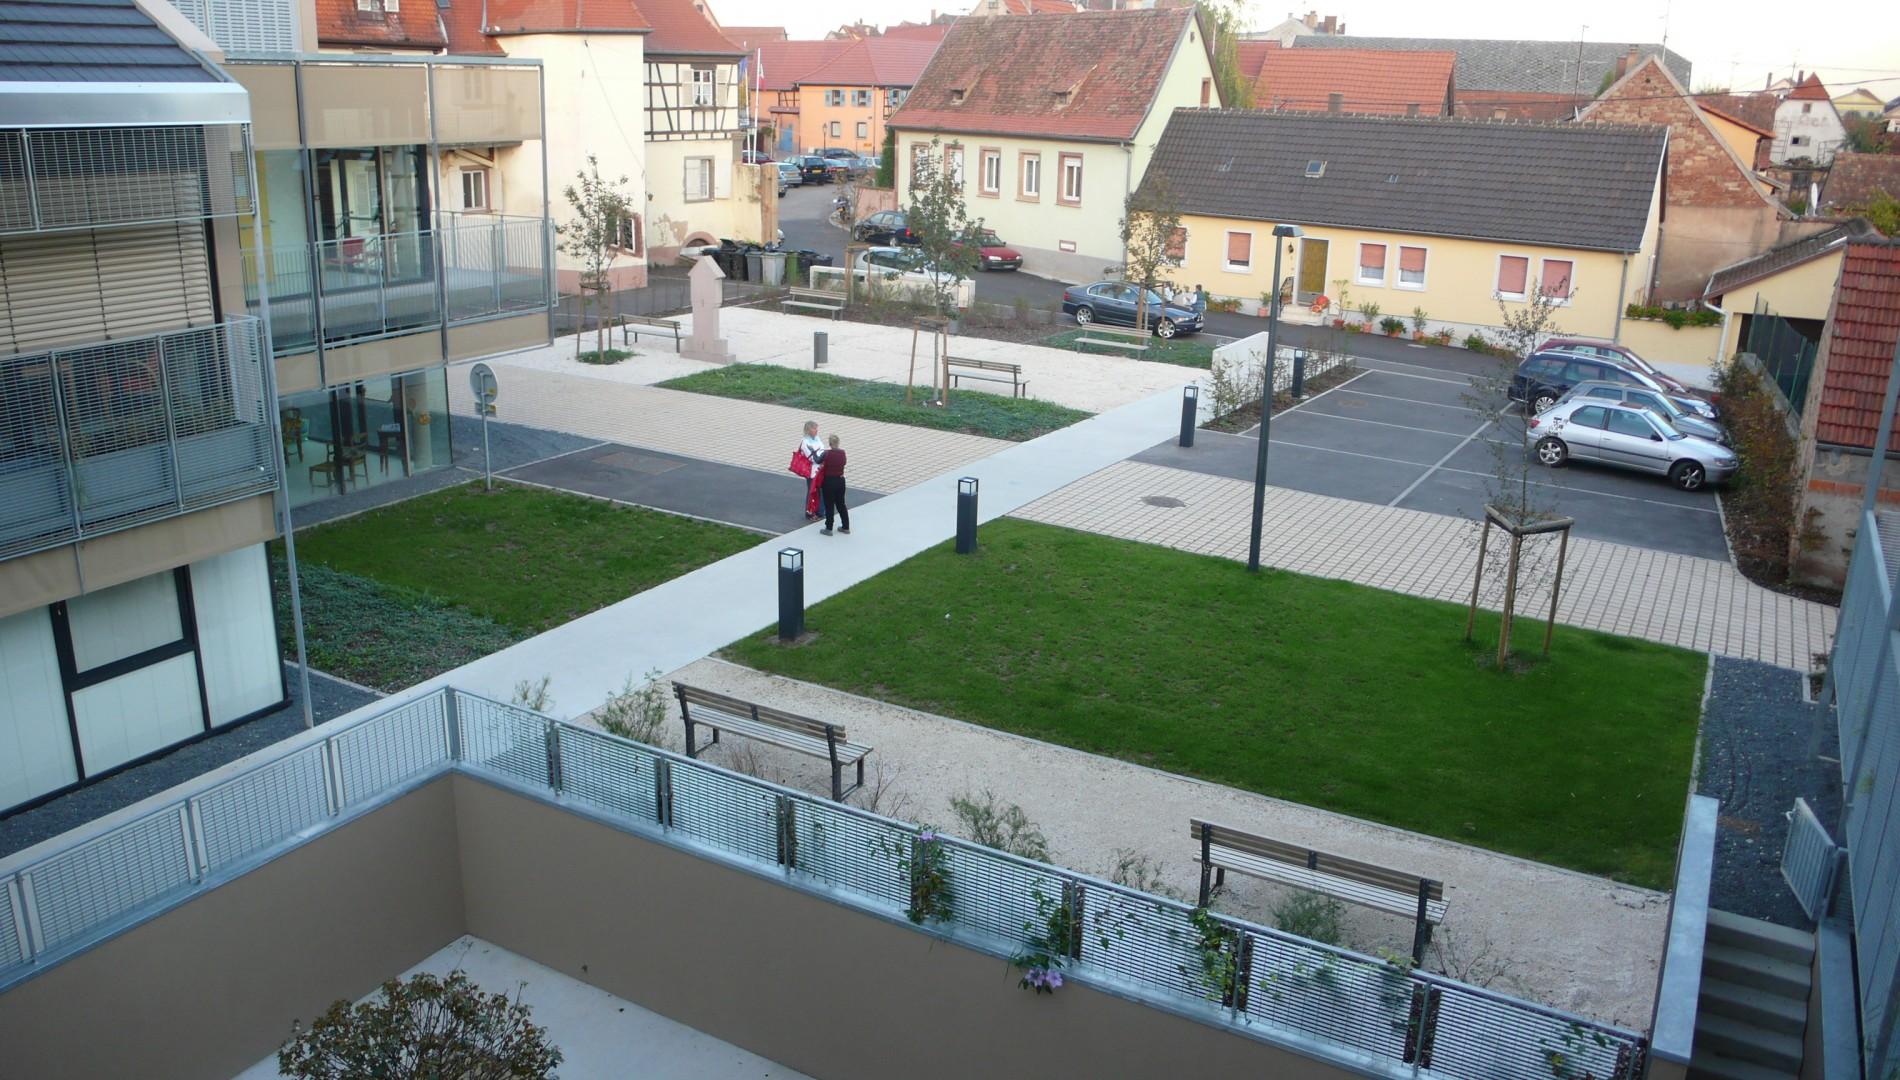 Maison de retraite marlenheim knl architecte for Architecture maison de retraite